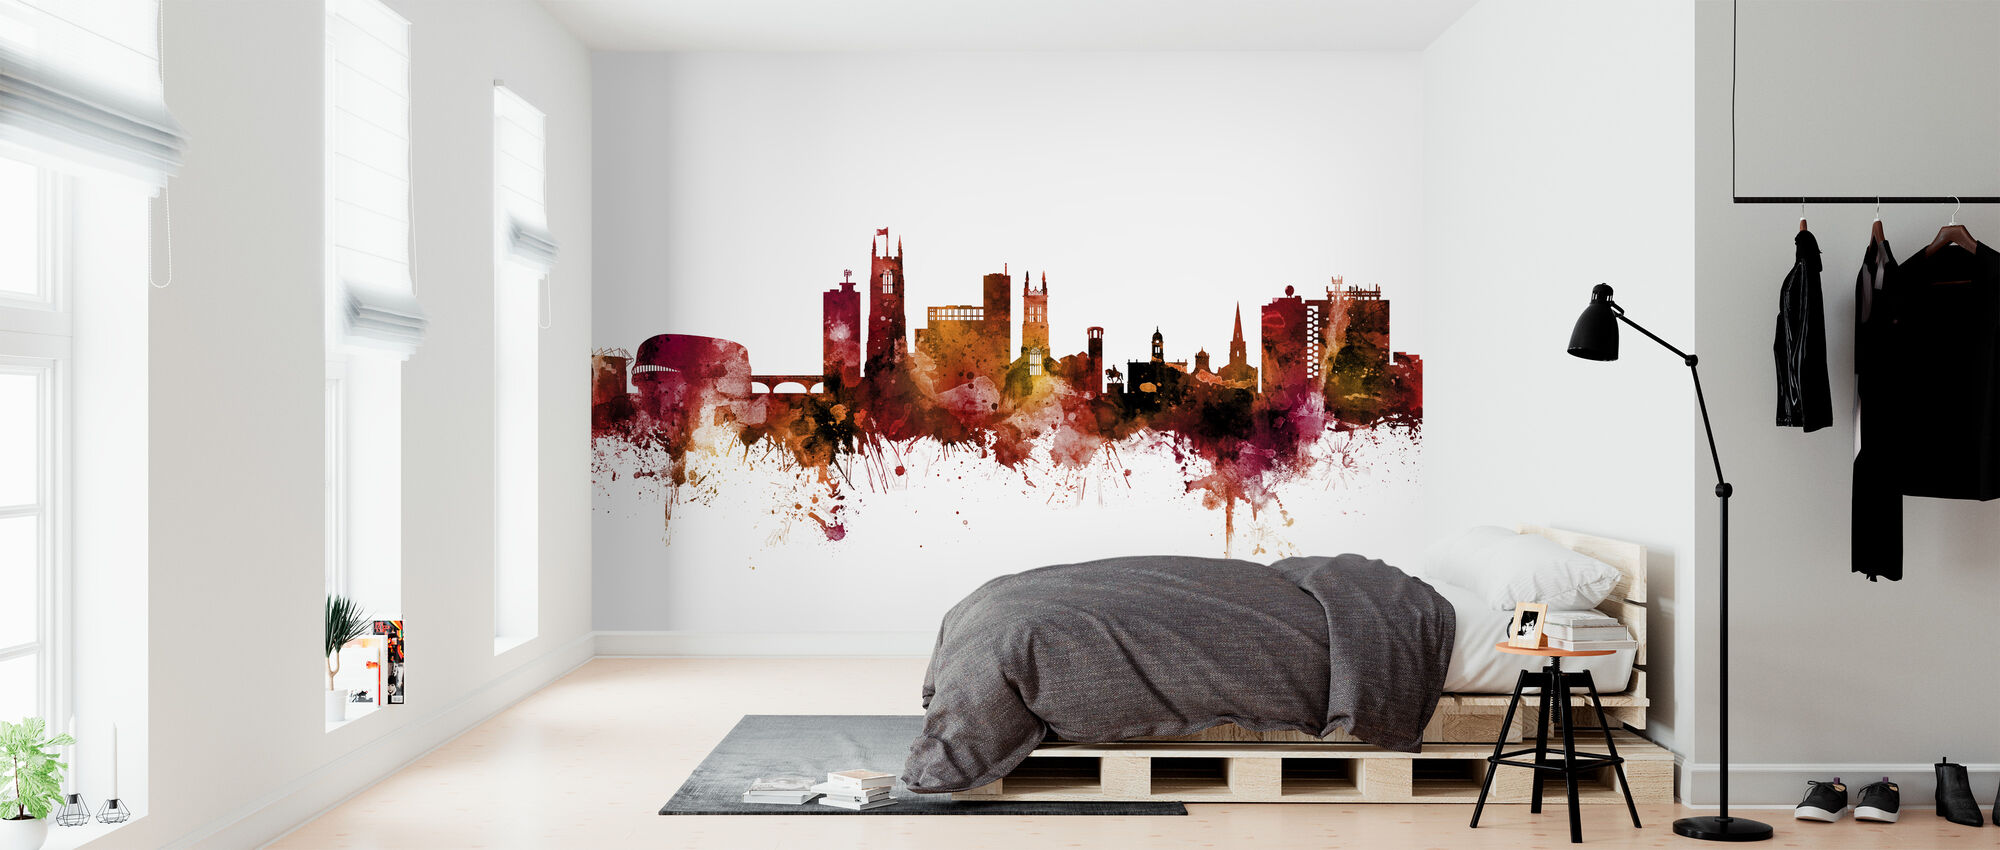 Derby England Skyline - Wallpaper - Bedroom